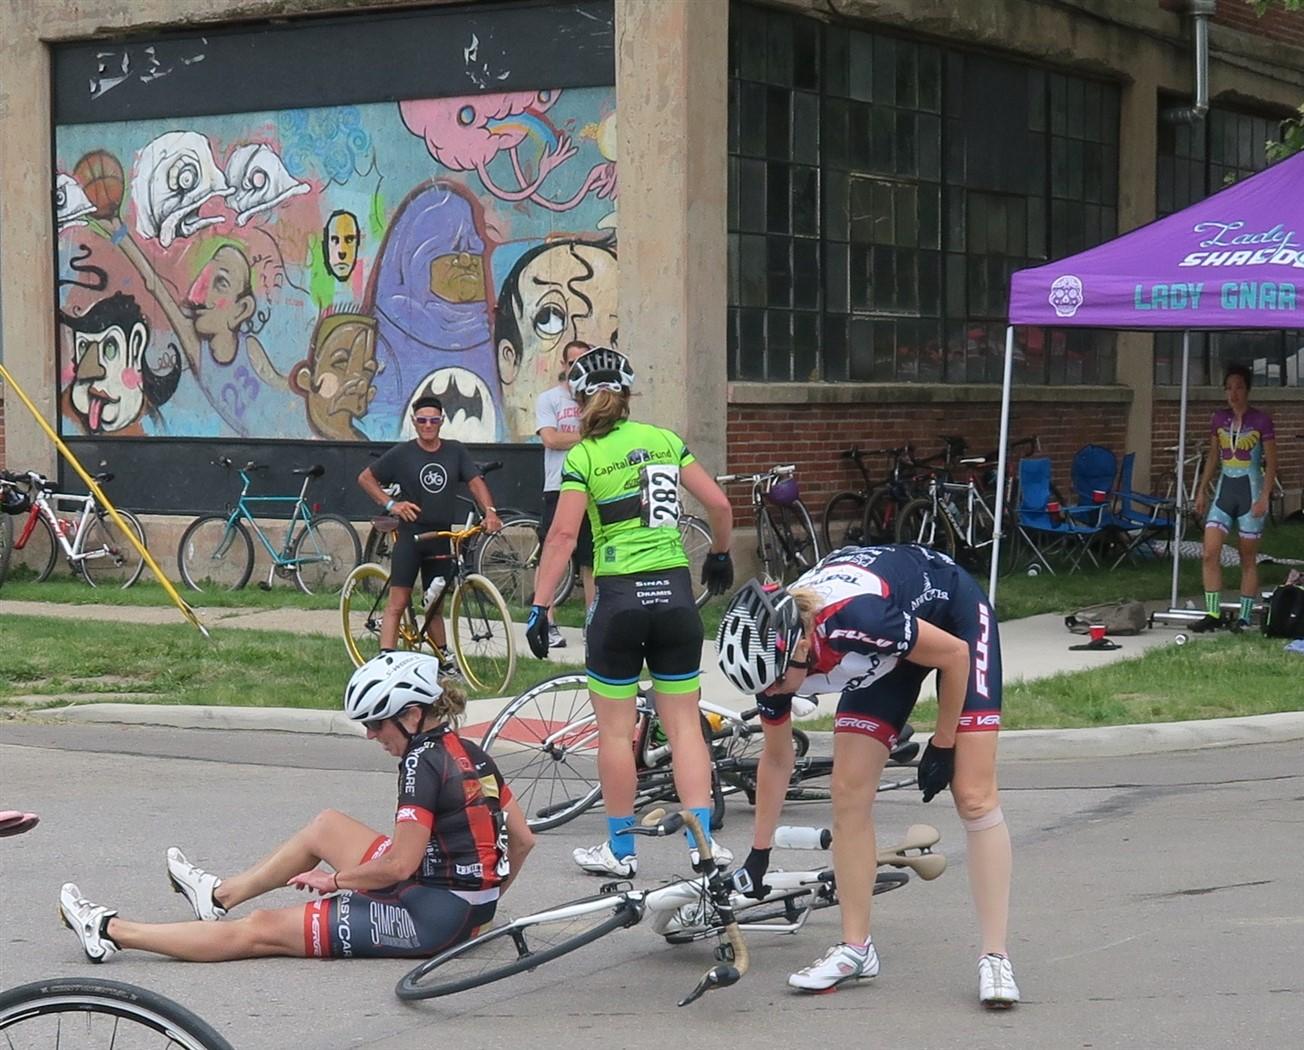 2015 06 07 162 Franklinton Bike Races.jpg